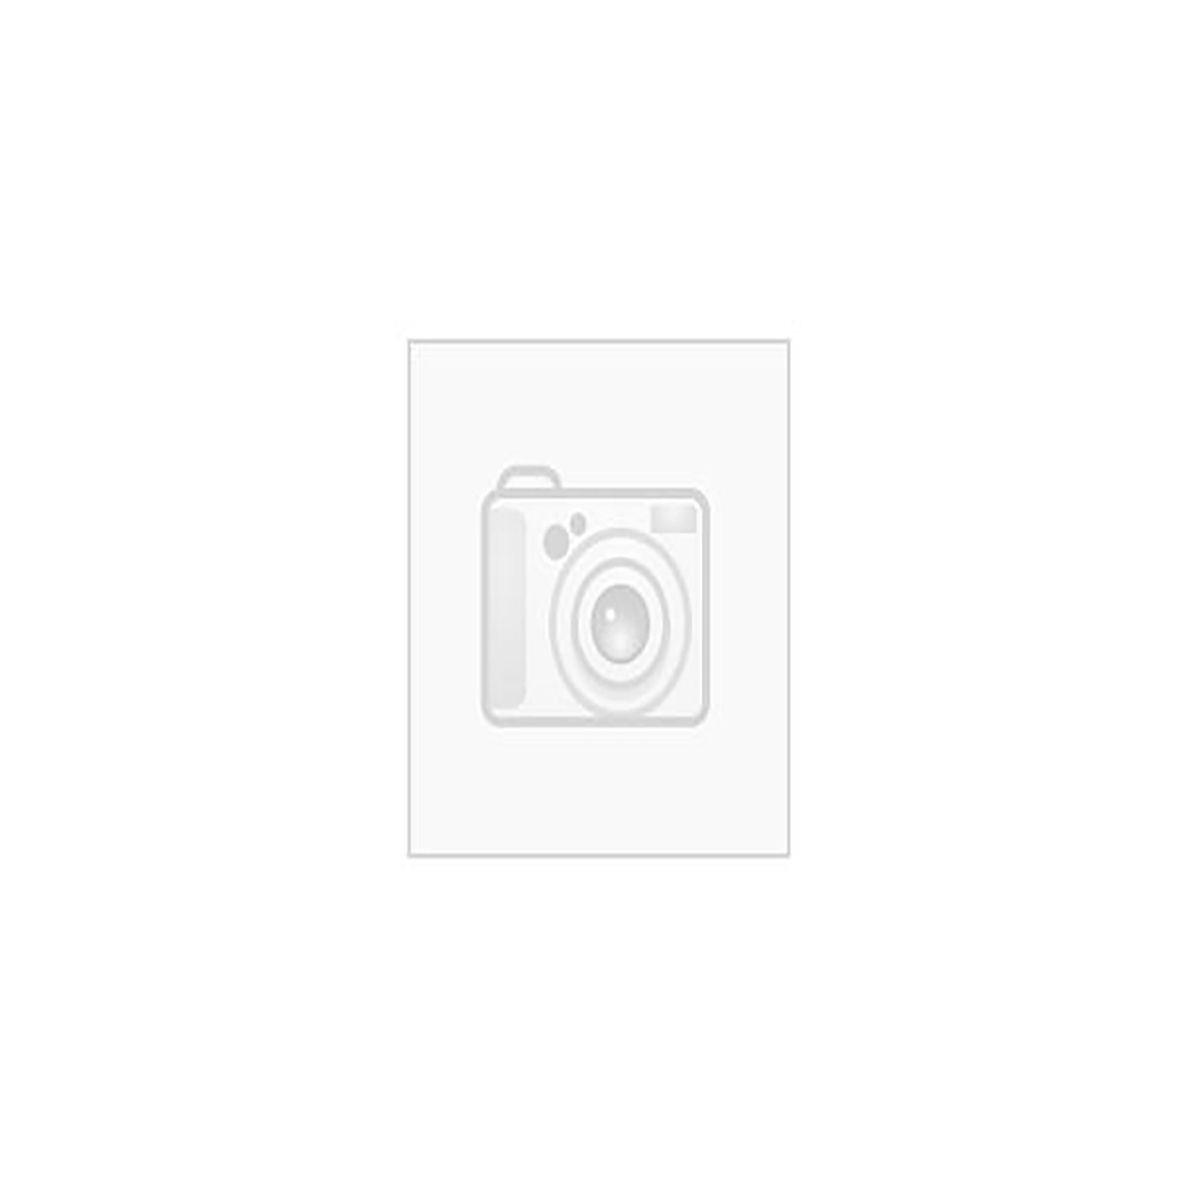 INR - DUSJVEGG LINC NIAGARA 90x90 - hvit profil